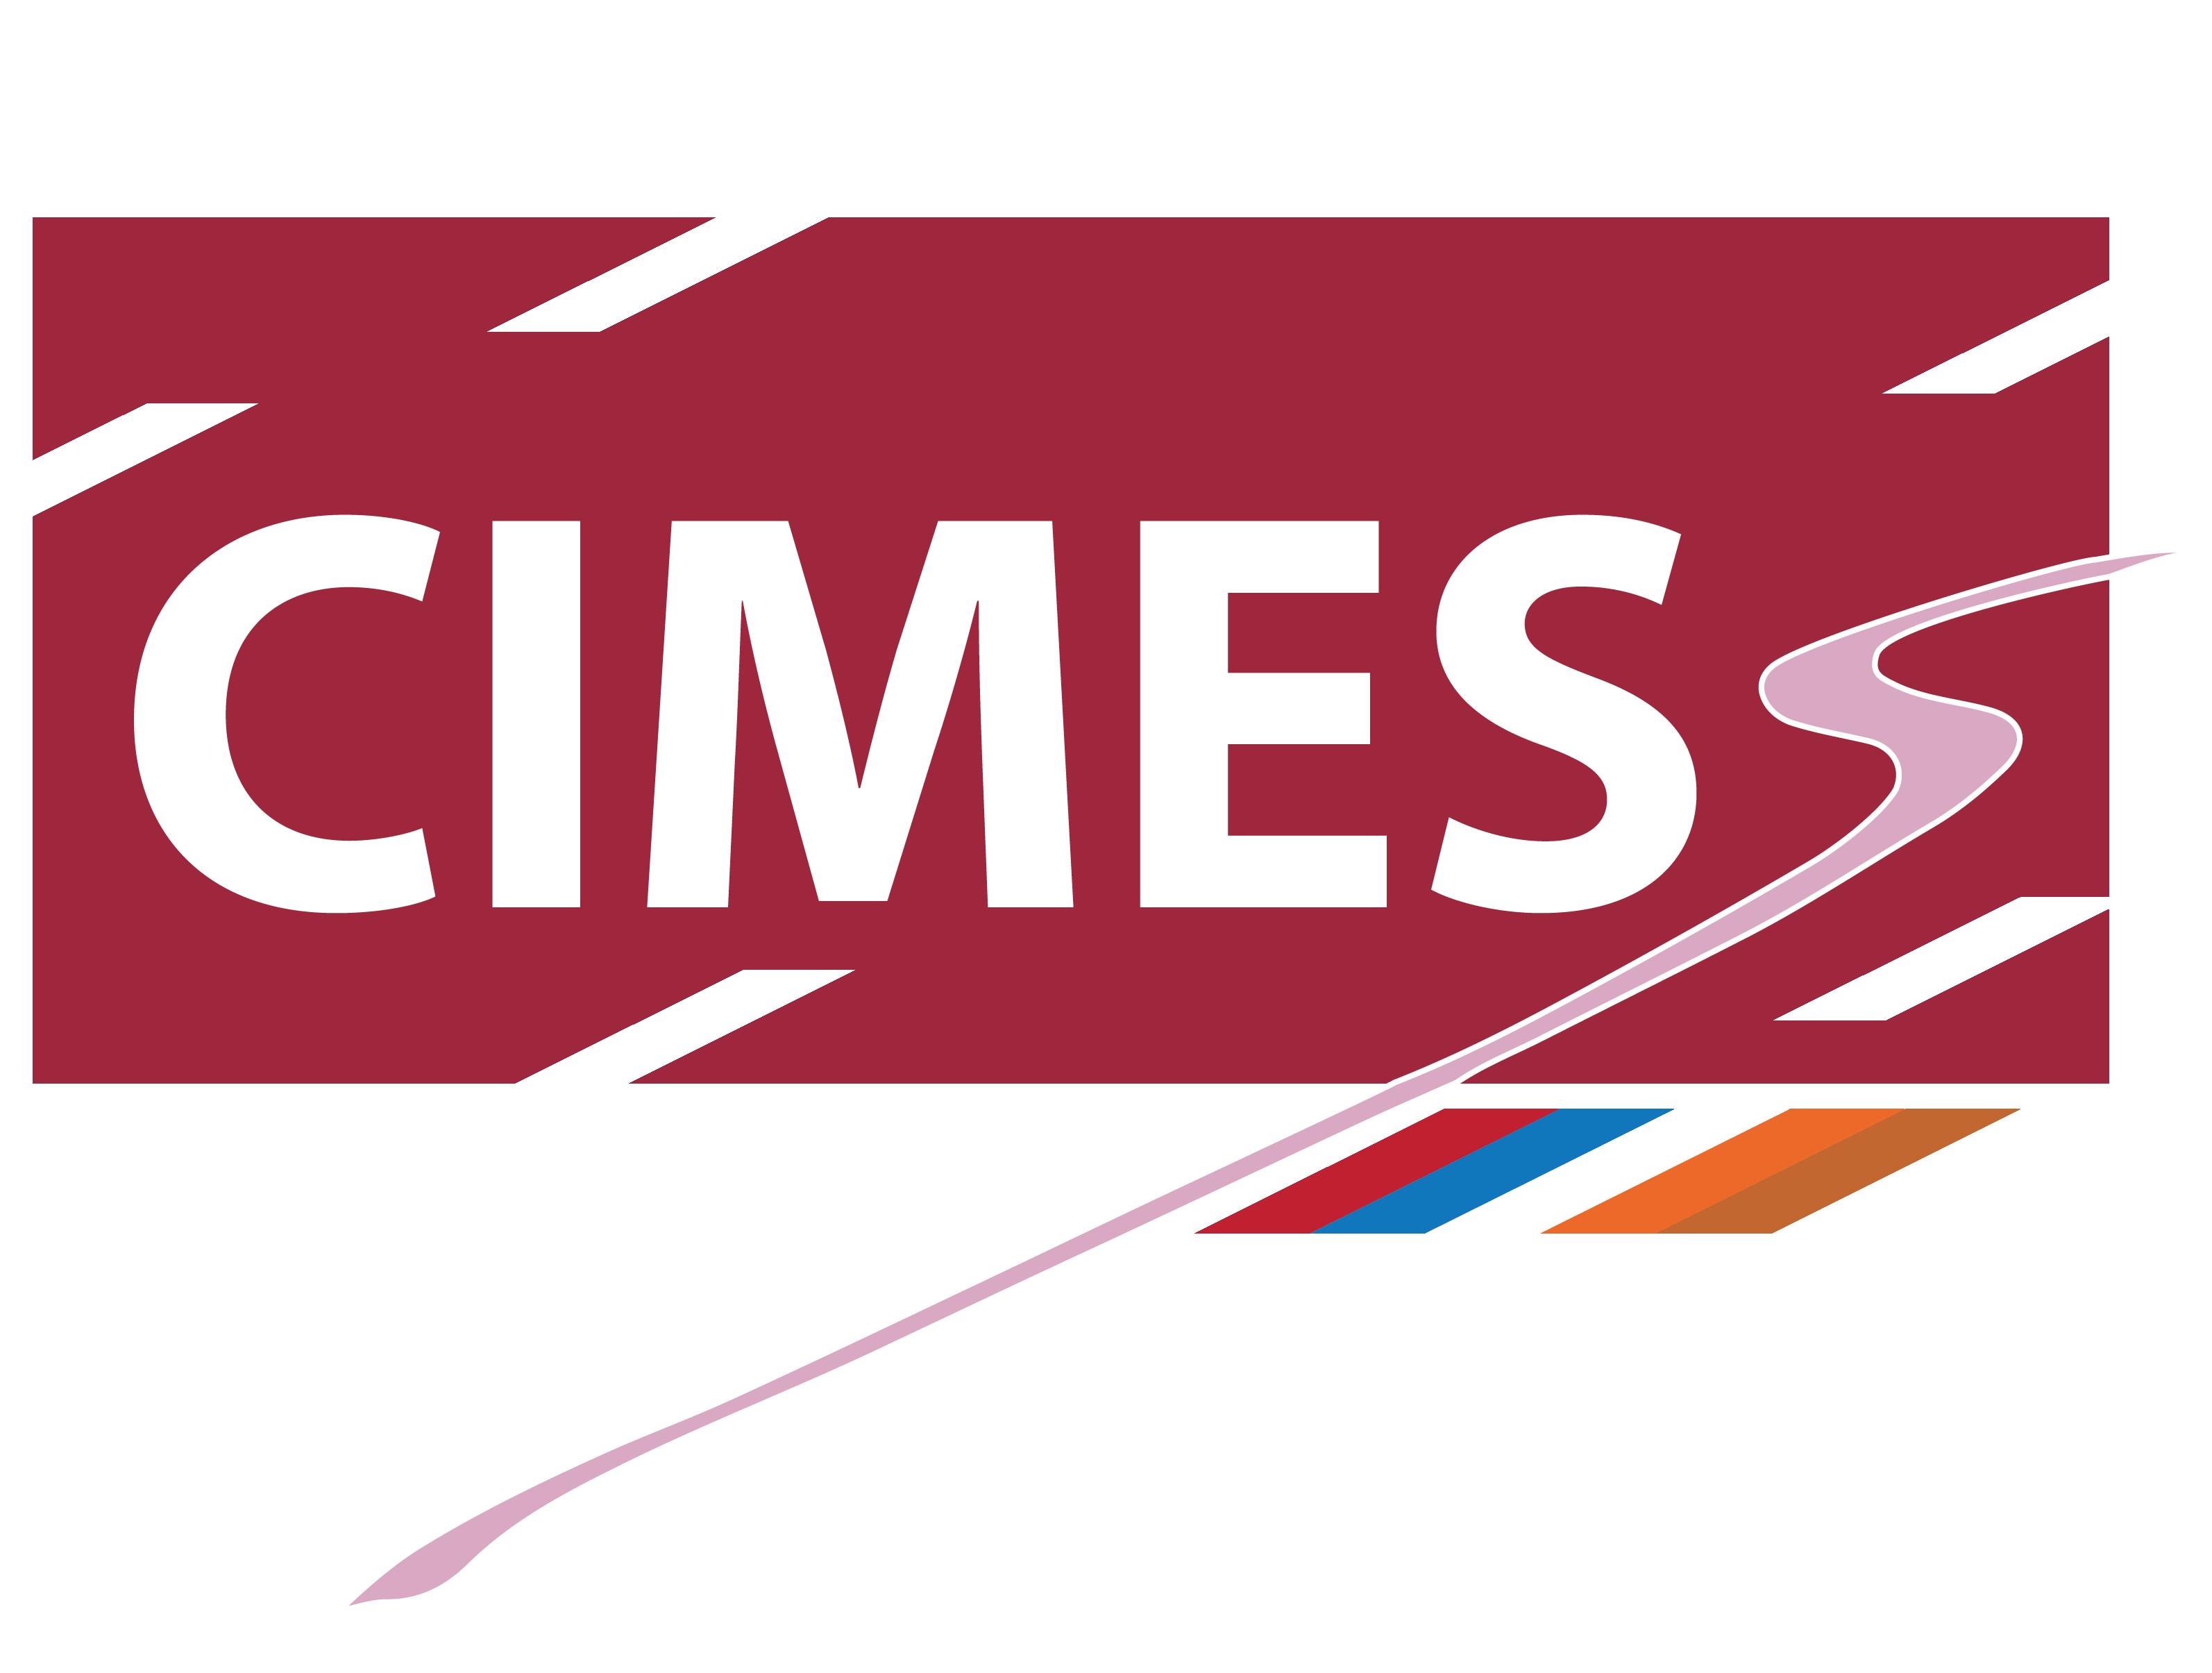 Cimess